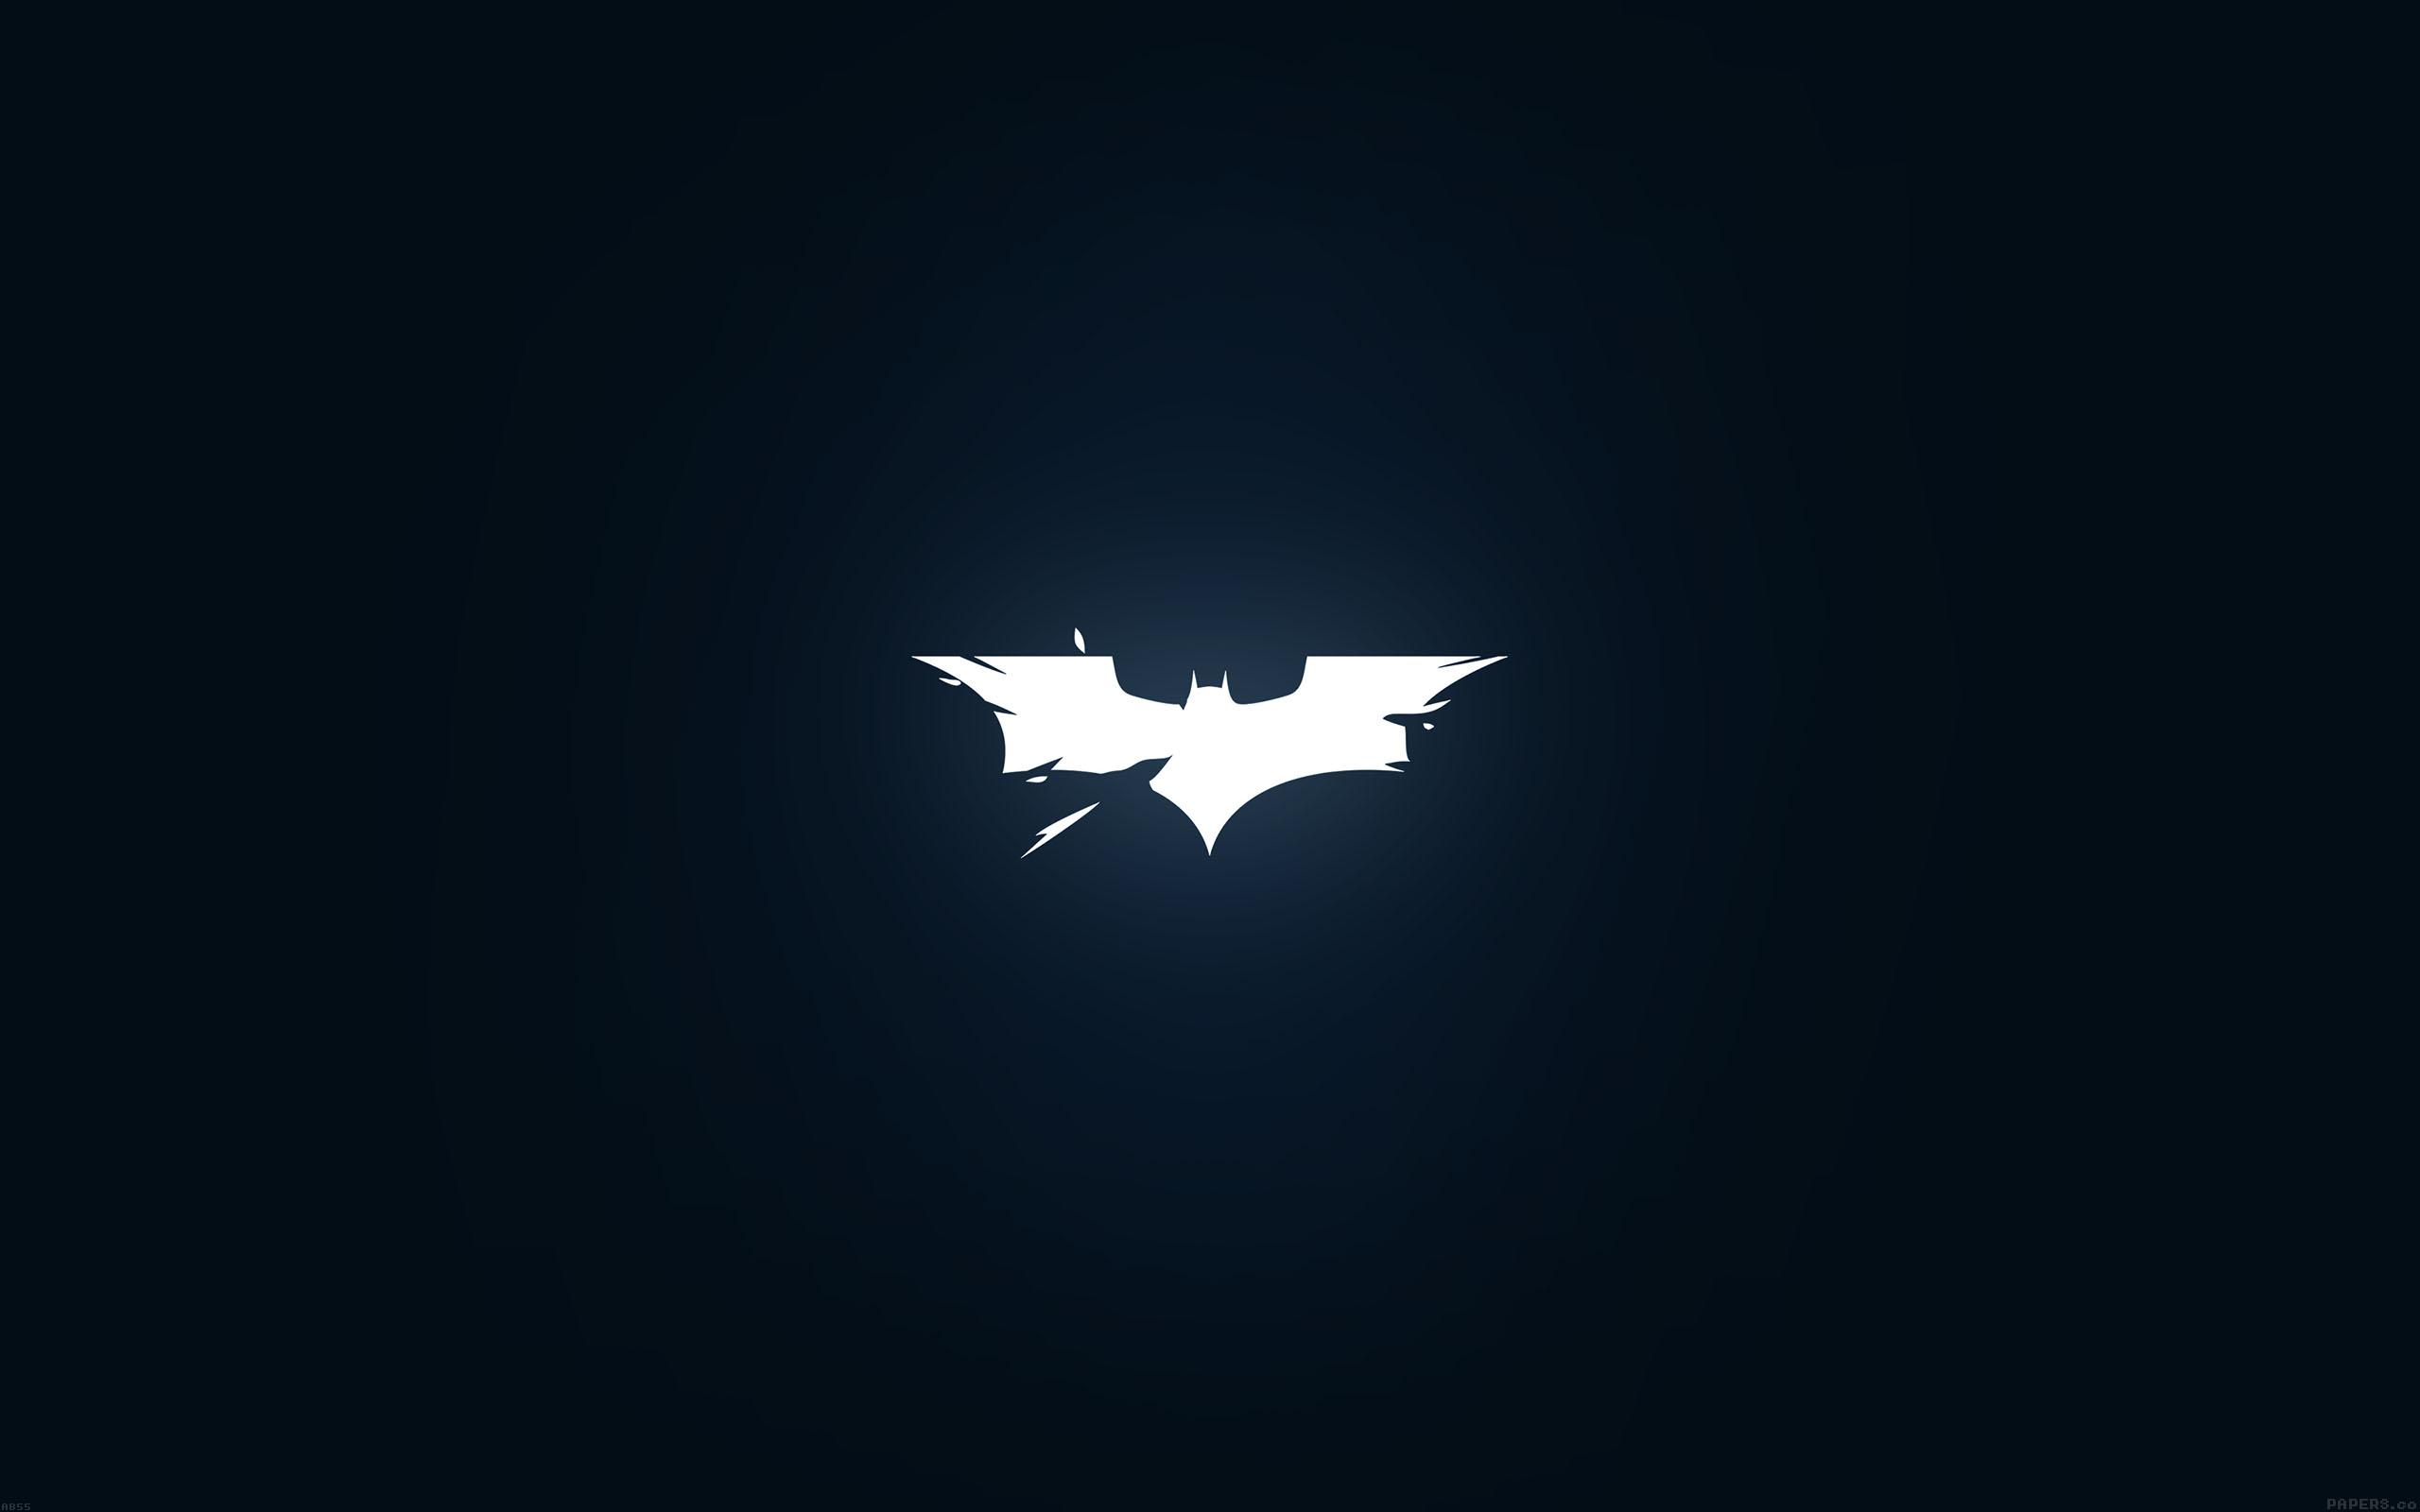 Shattered Iphone X Wallpaper Ab55 Wallpaper Batman Logo Dark Shattered Papers Co